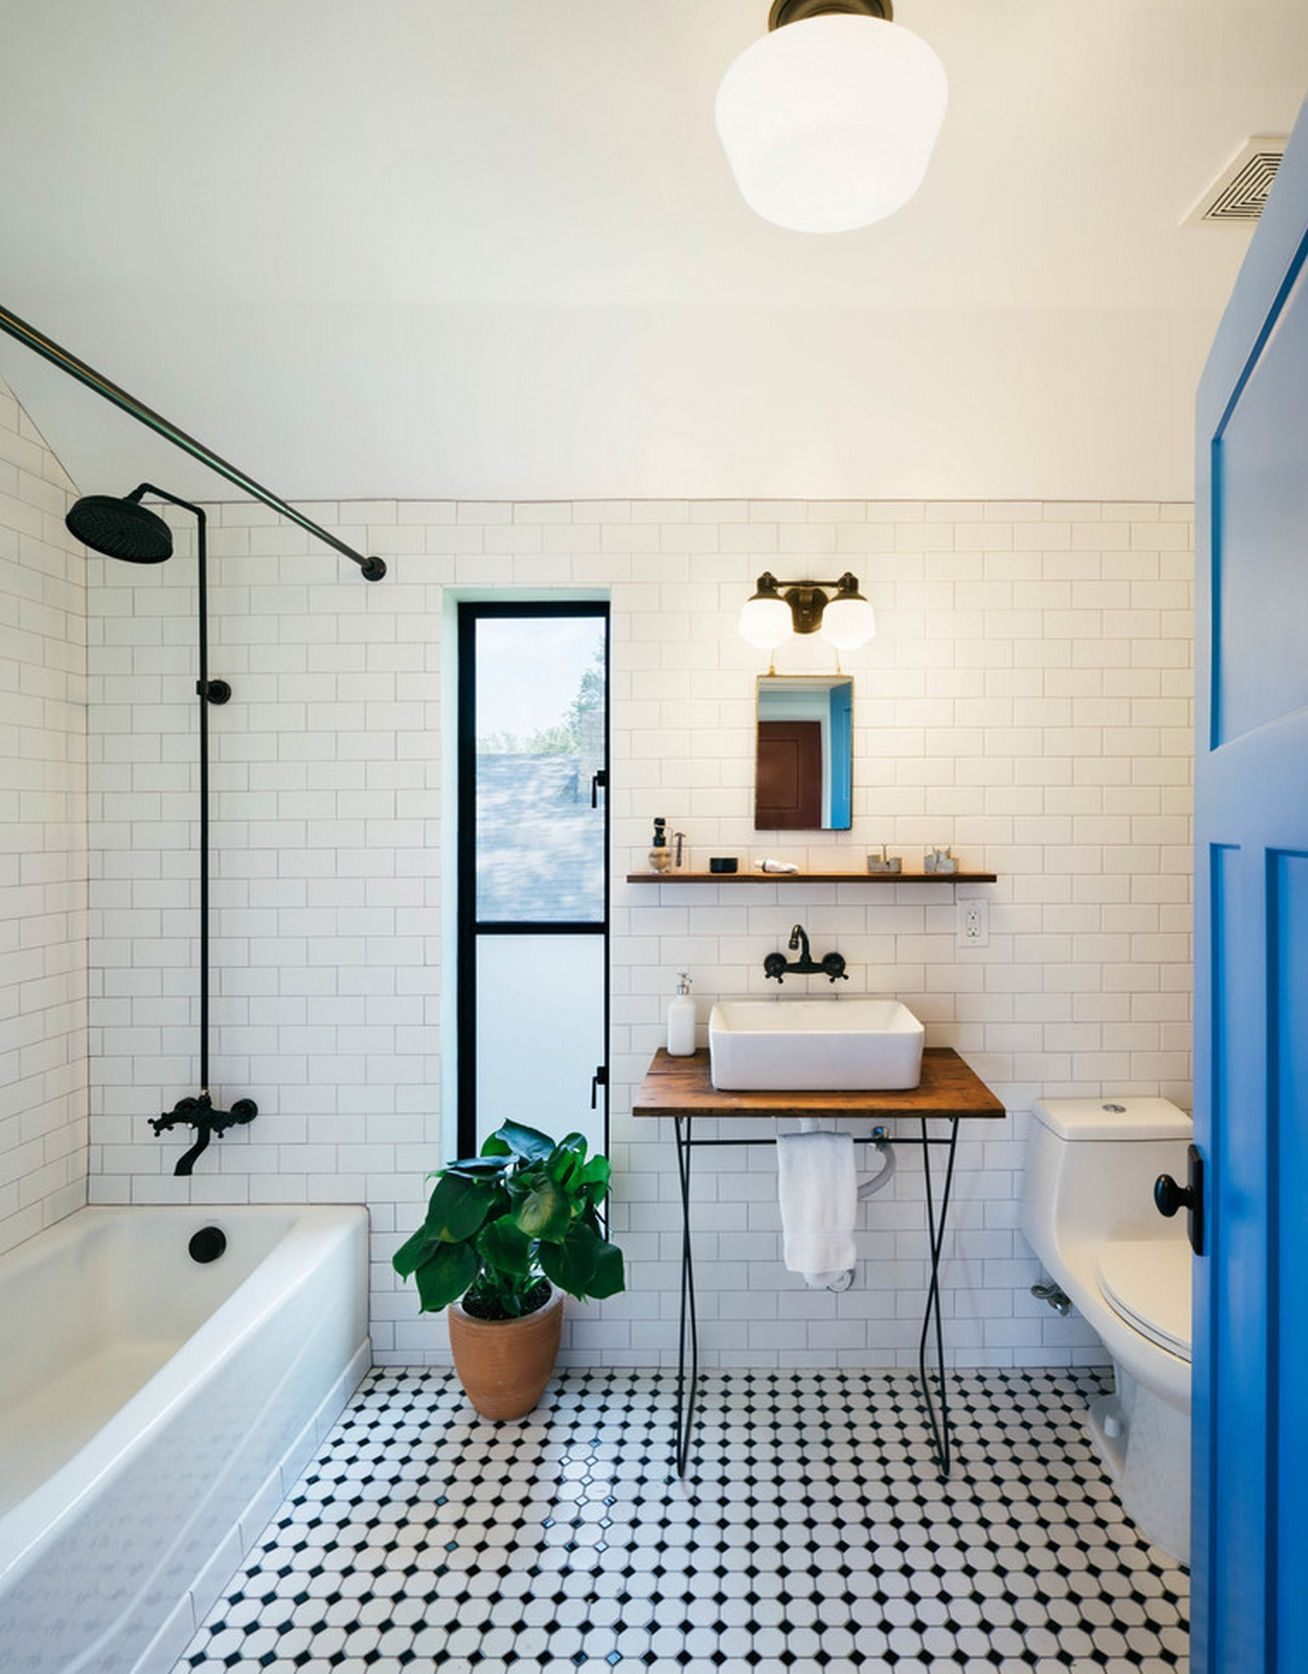 Bathroom Design July 2014 73   Bathroom   Pinterest   Bathroom ...